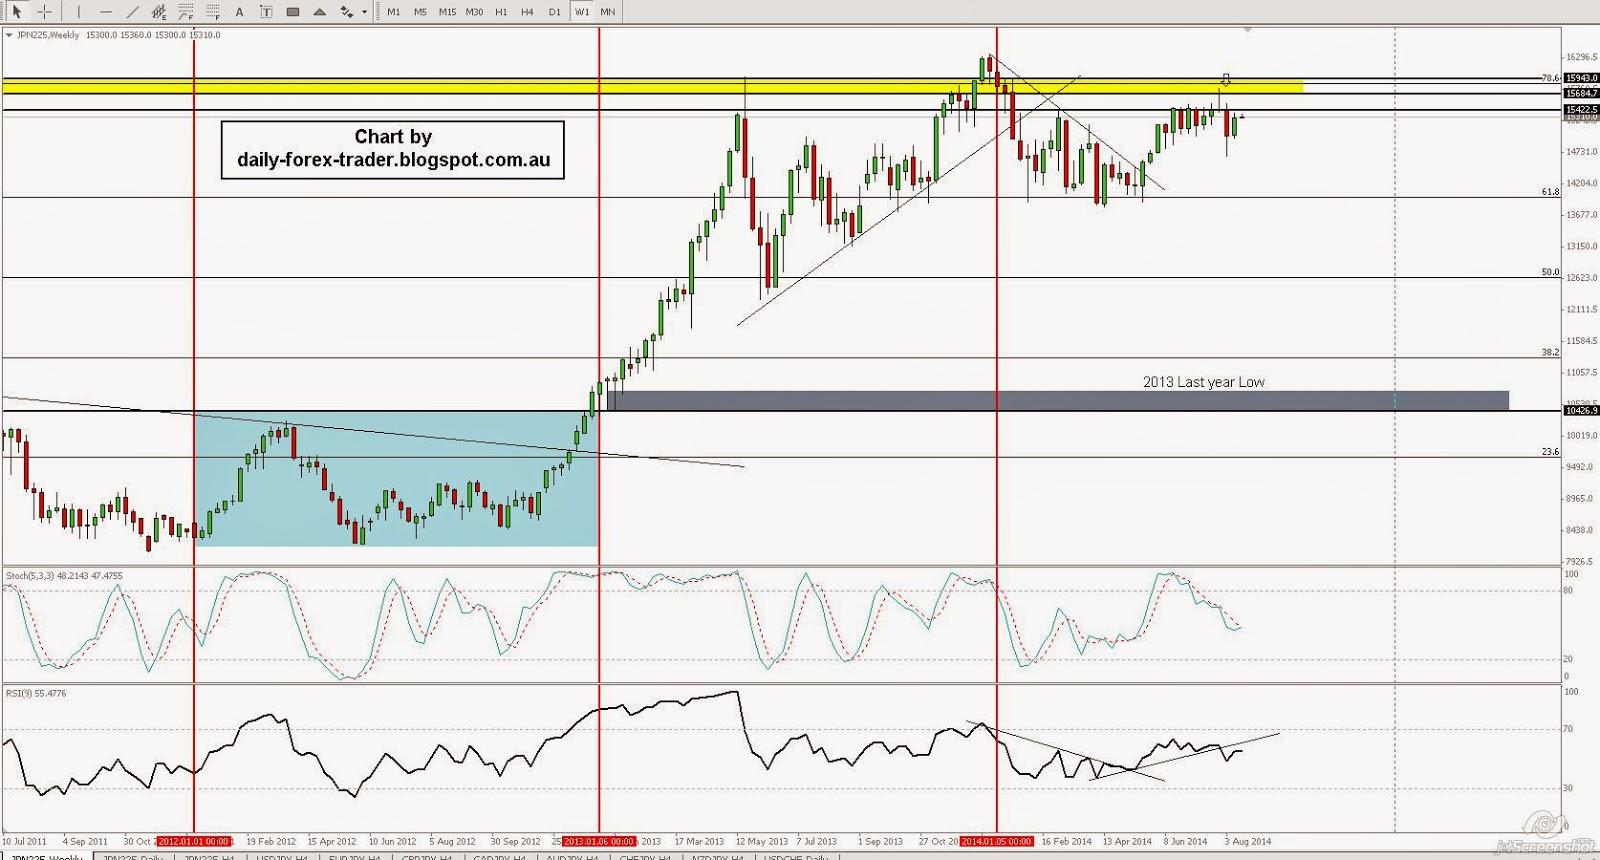 JPN225 Tests Resistance For Range Traders - DailyFX